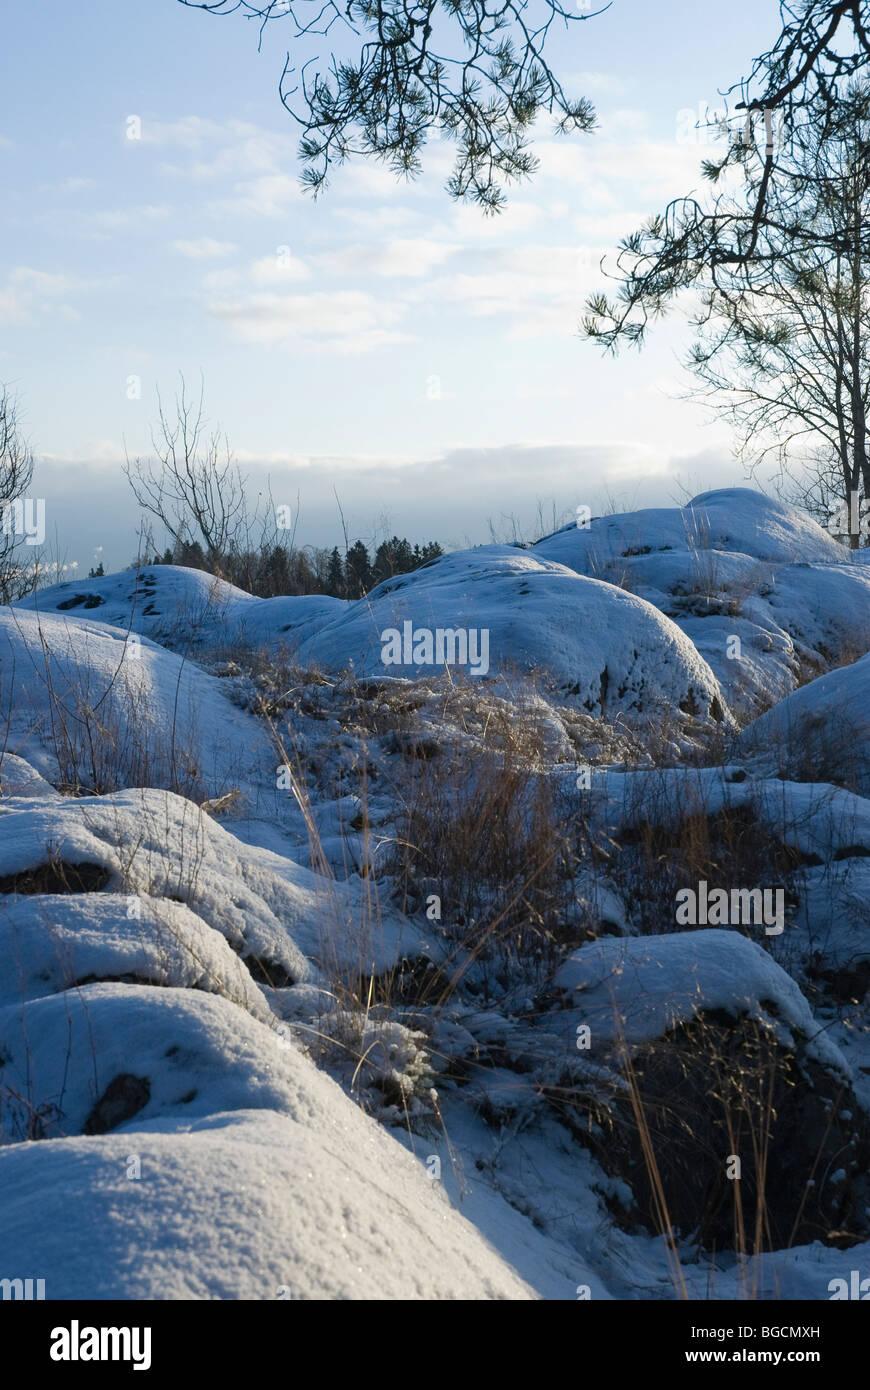 Finnish winter landscape - Stock Image